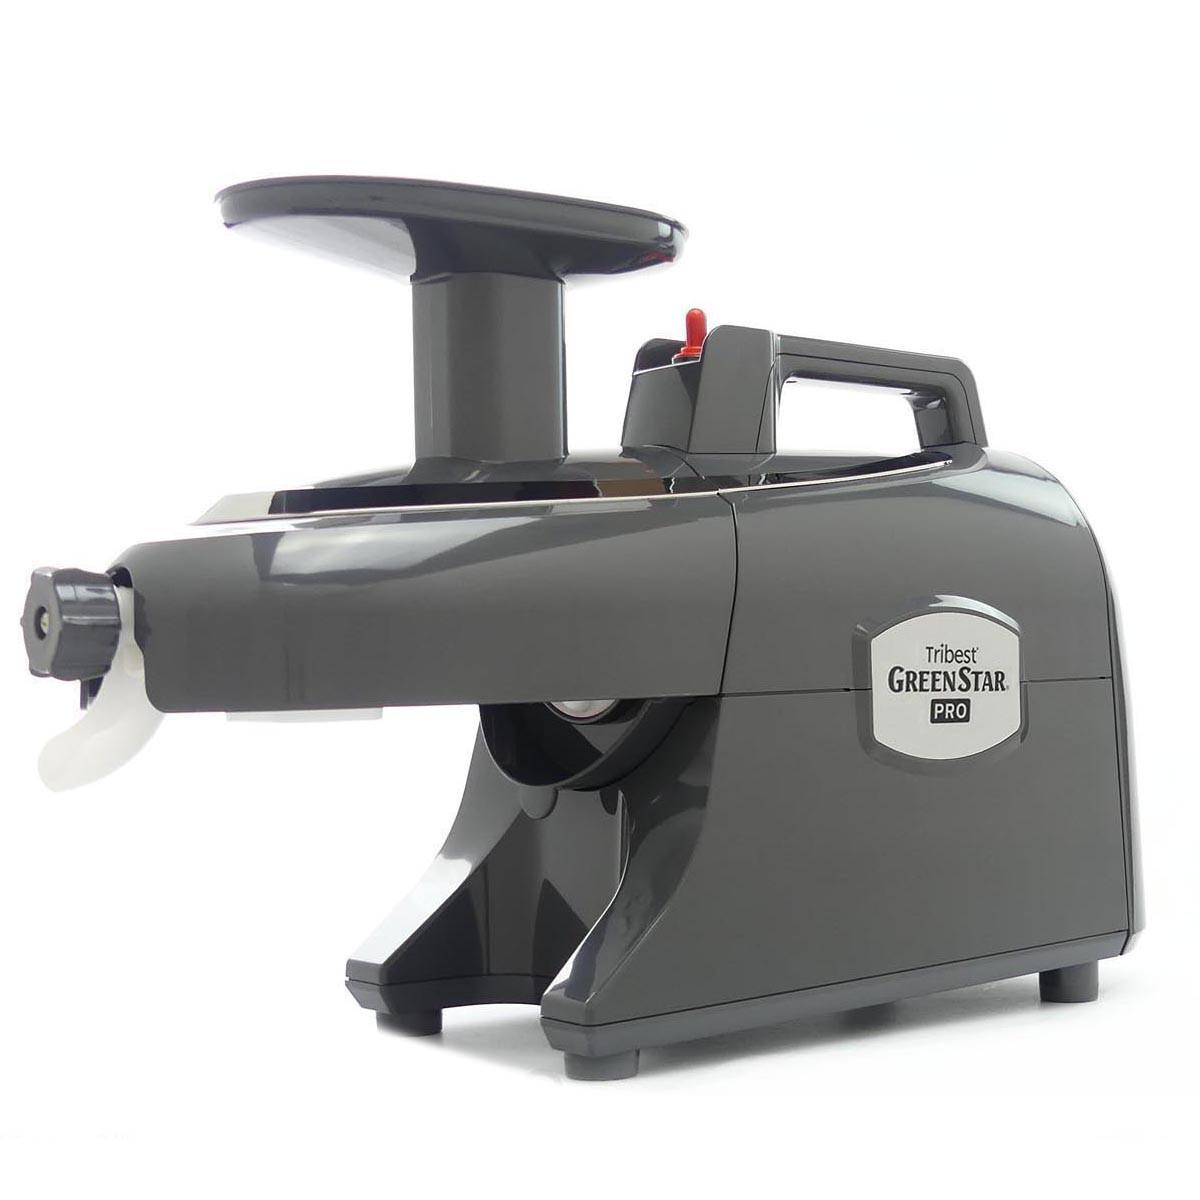 Green Star Pro Commercial Twin Gear Juicer in Grey